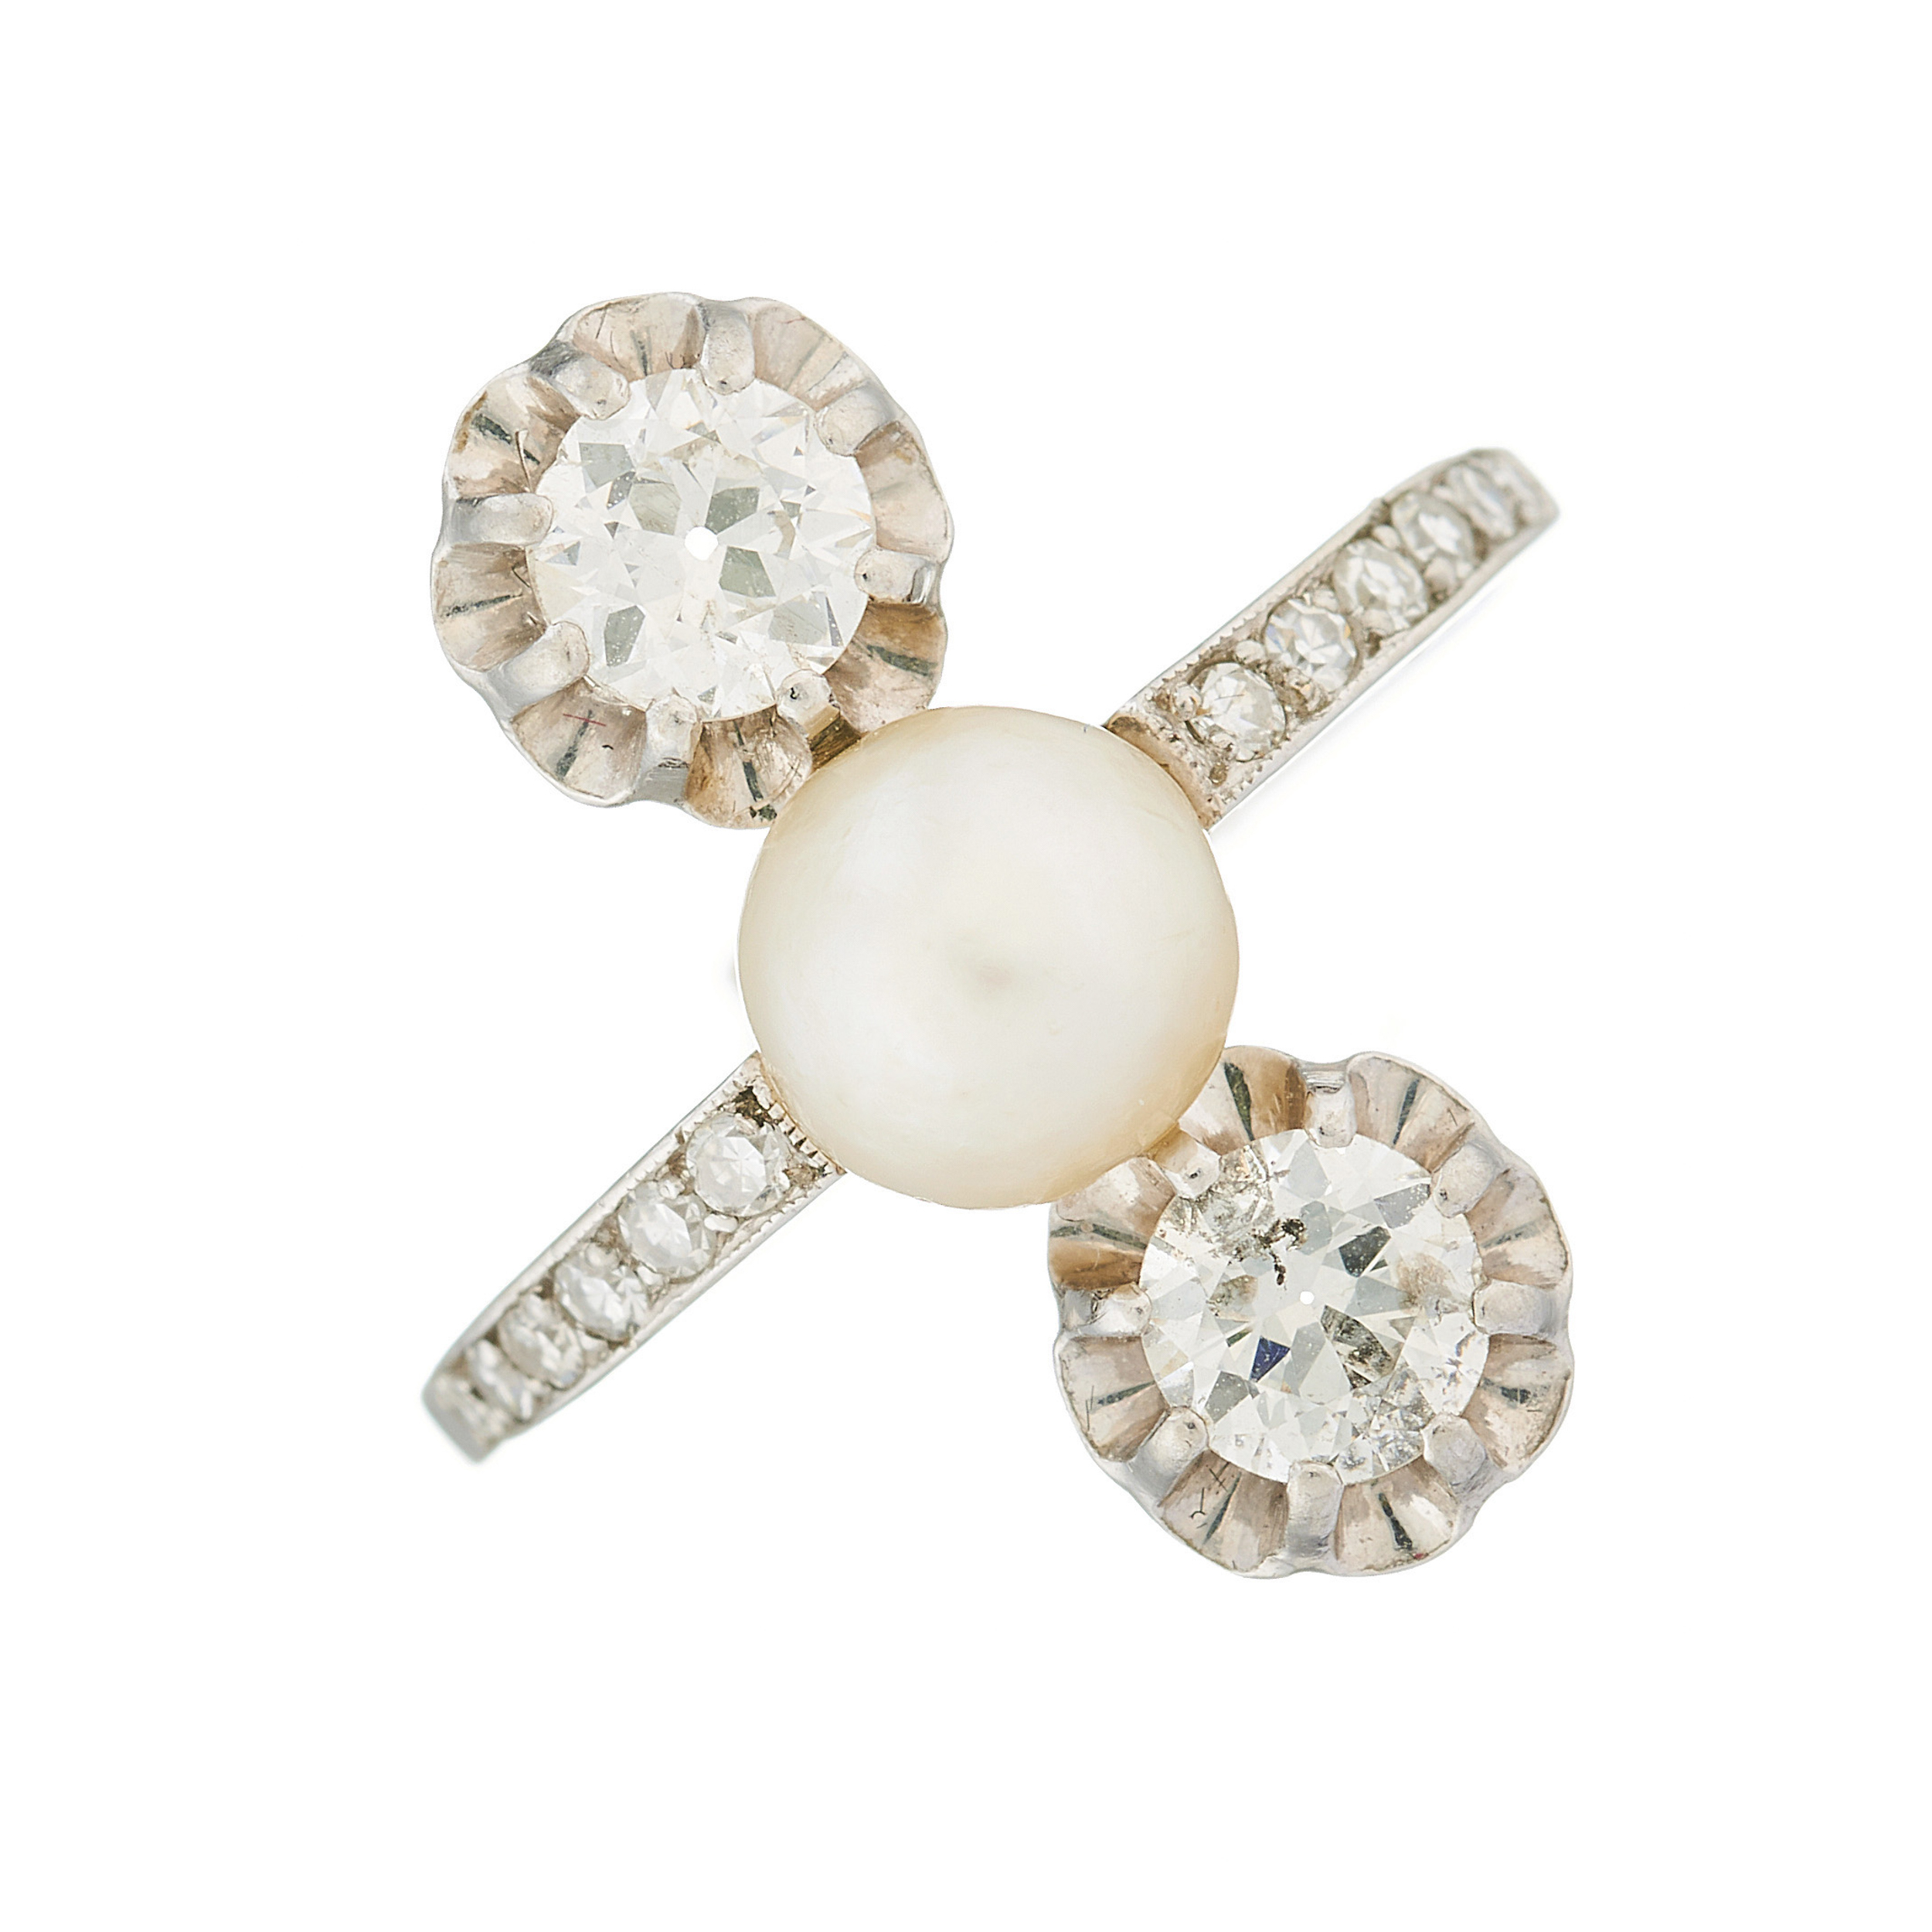 An Edwardian platinum, natural pearl and diamond three-stone dress ring